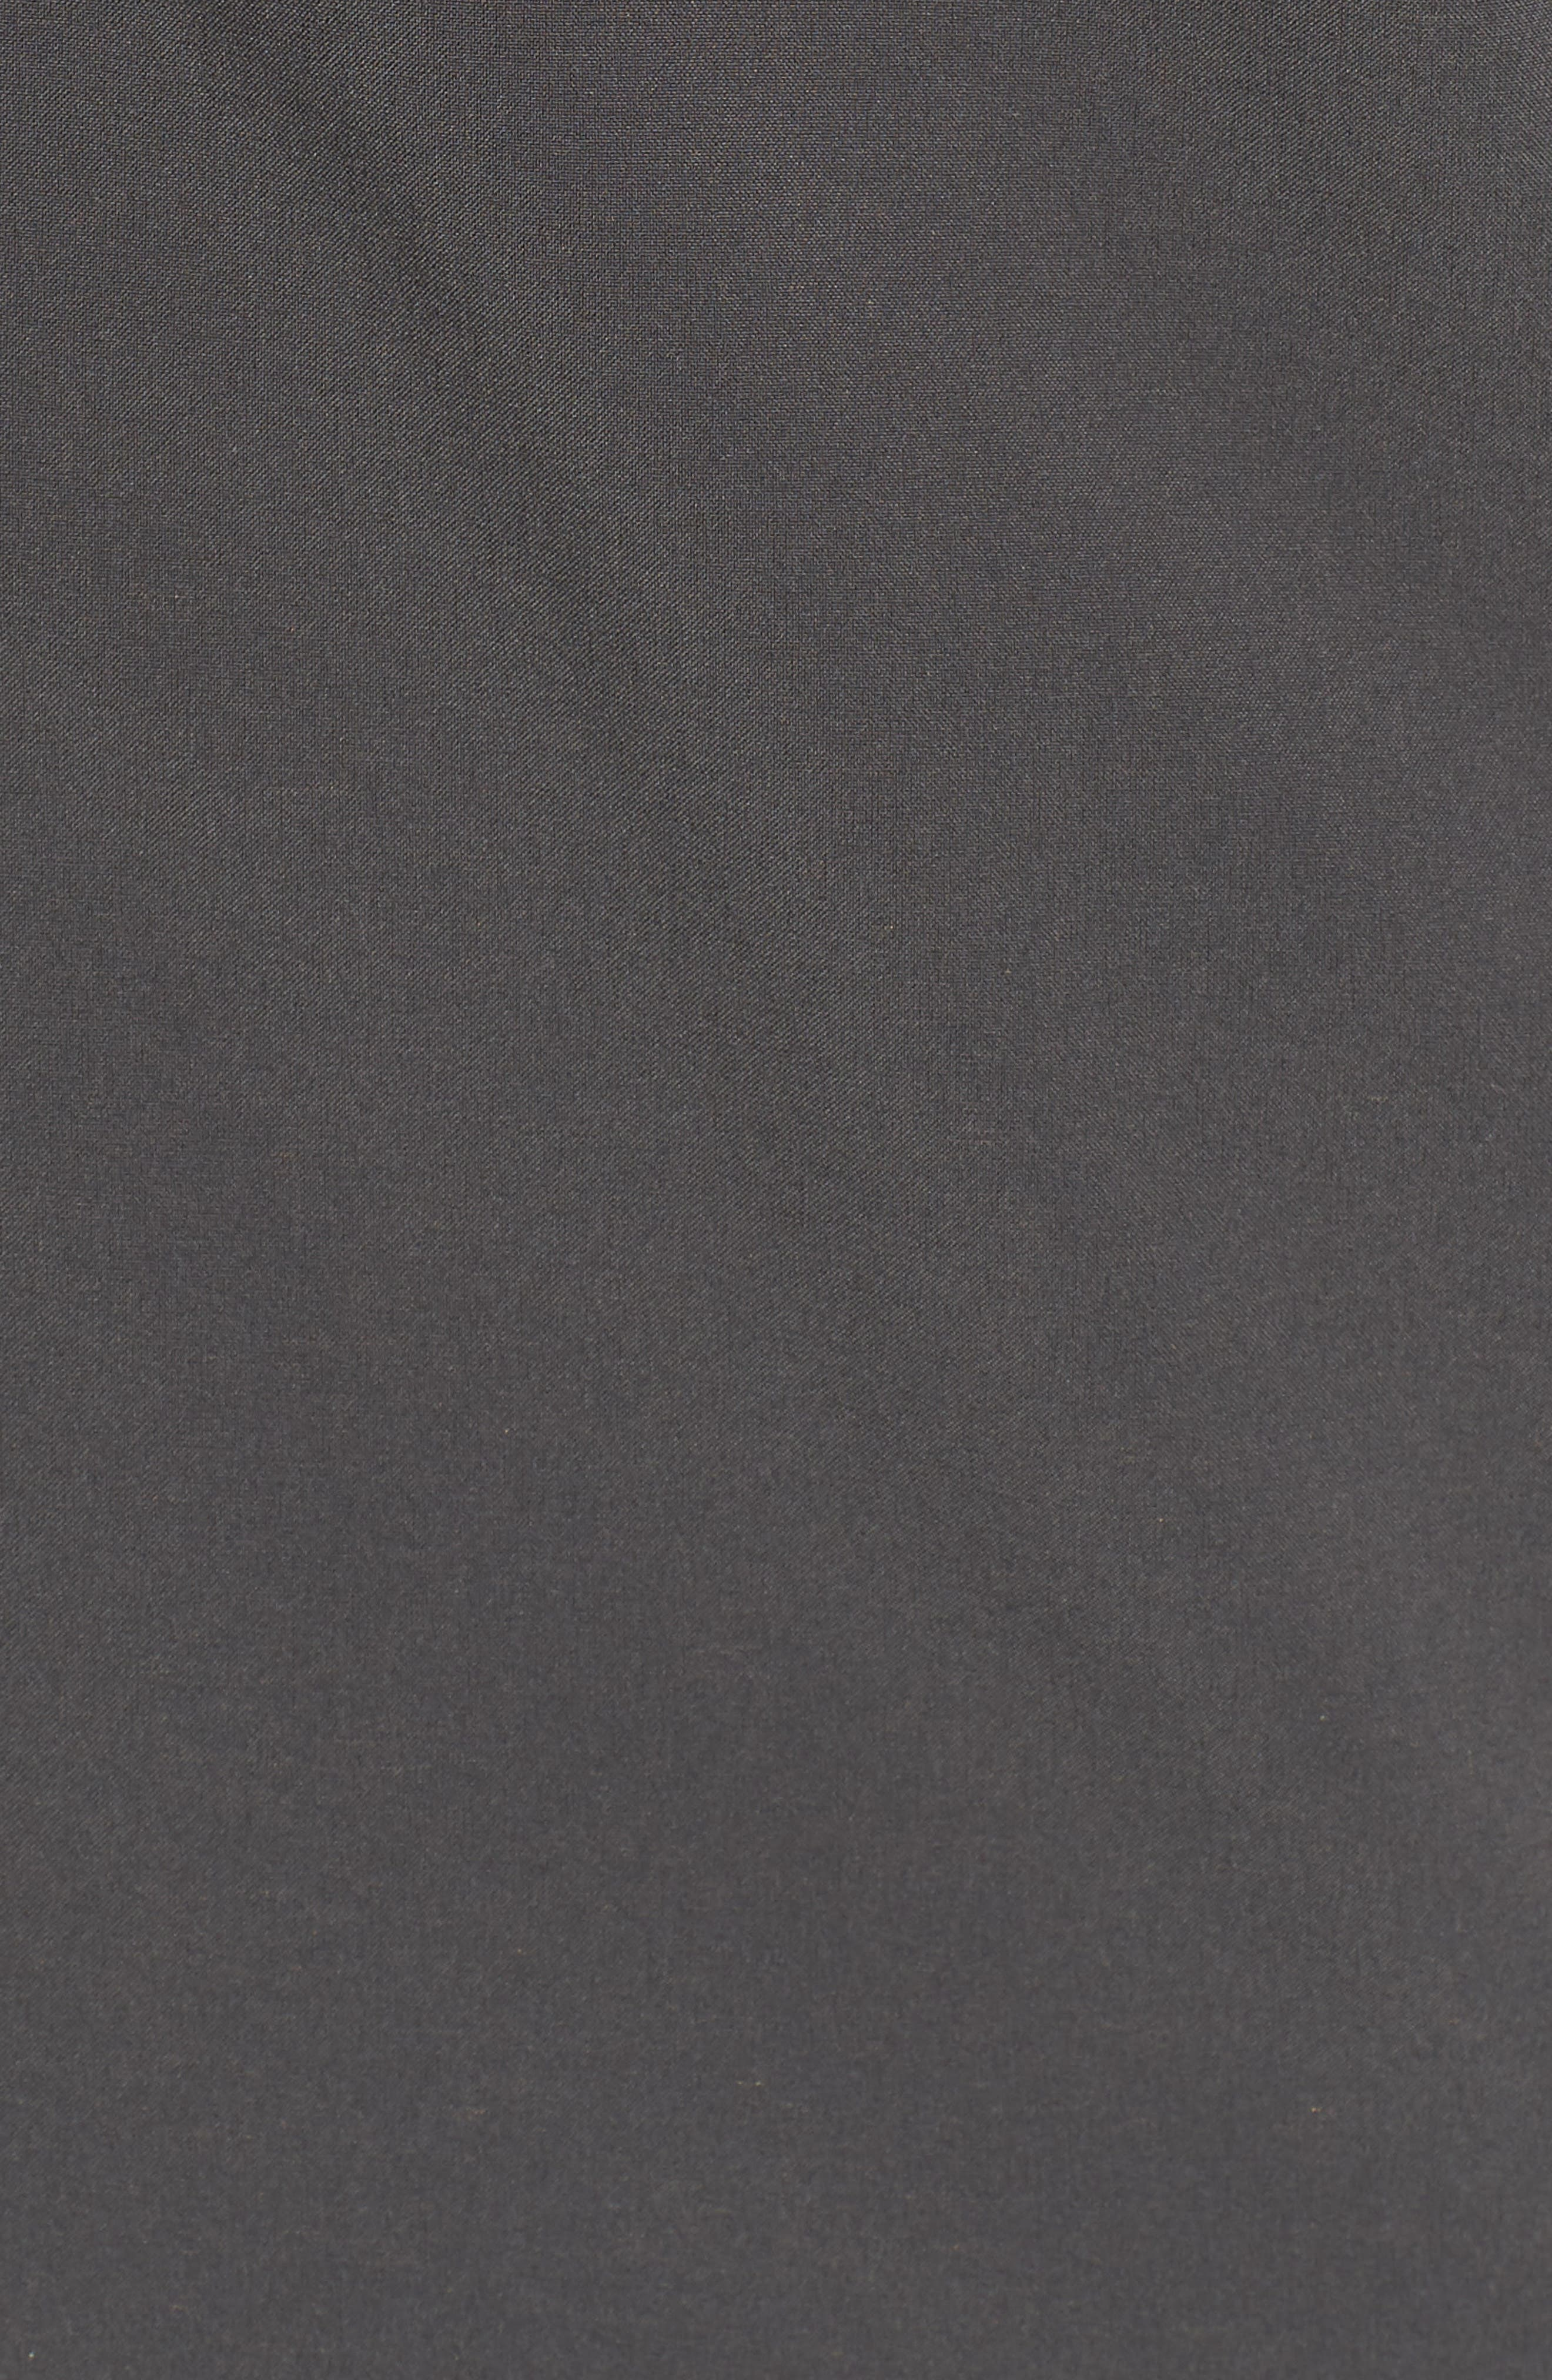 'Apex Bionic 2' Windproof & Water Resistant Soft Shell Jacket,                             Alternate thumbnail 6, color,                             ASPHALT GREY/ASPHALT GREY